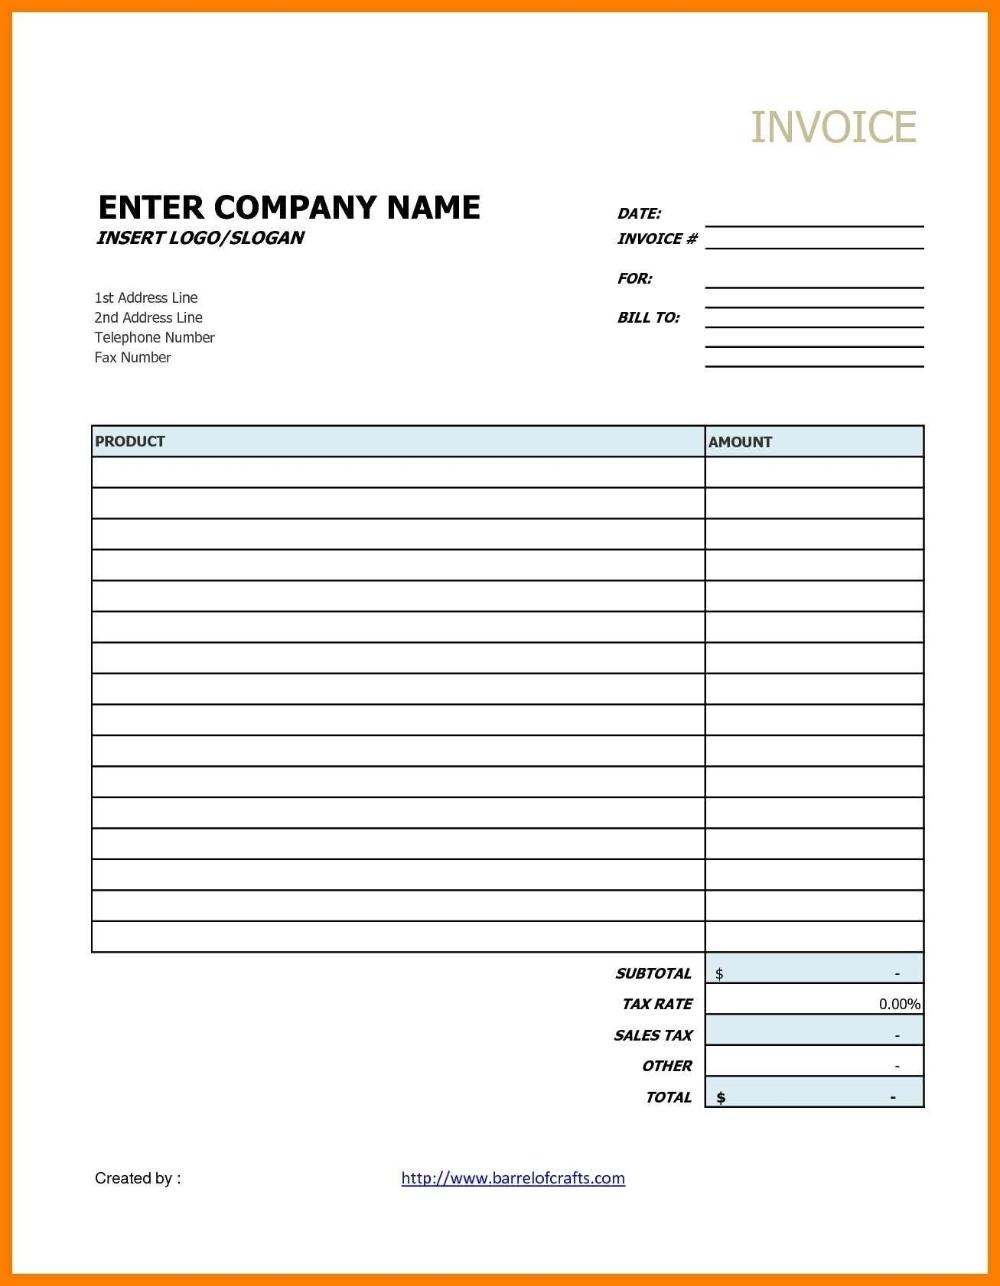 Invoice Template Google Drive Ideas Contractor Docs Best